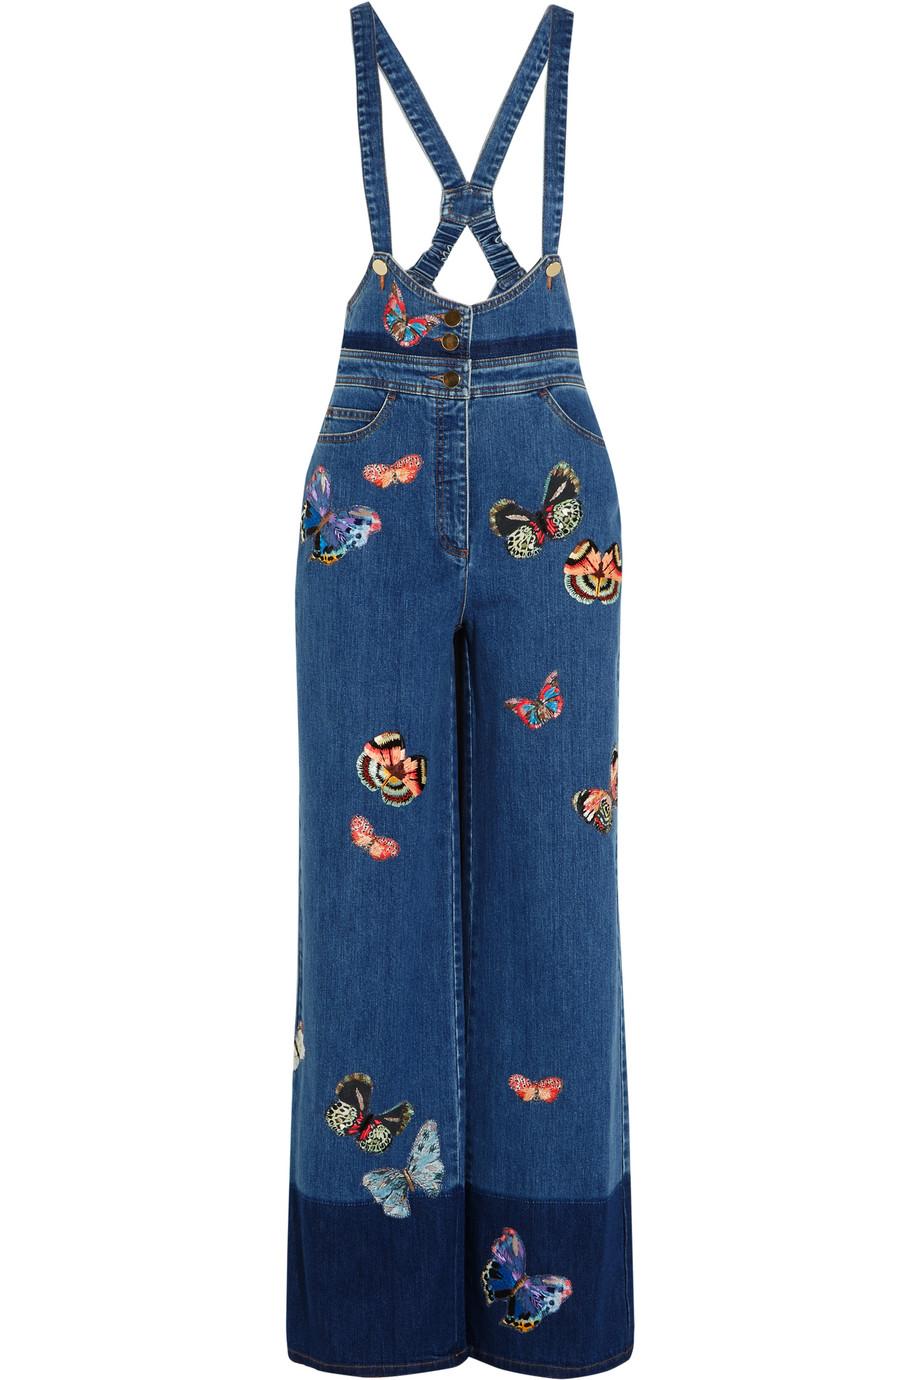 Valentino Embroidered Stretch-Denim Jumpsuit, Blue, Women's, Size: 25